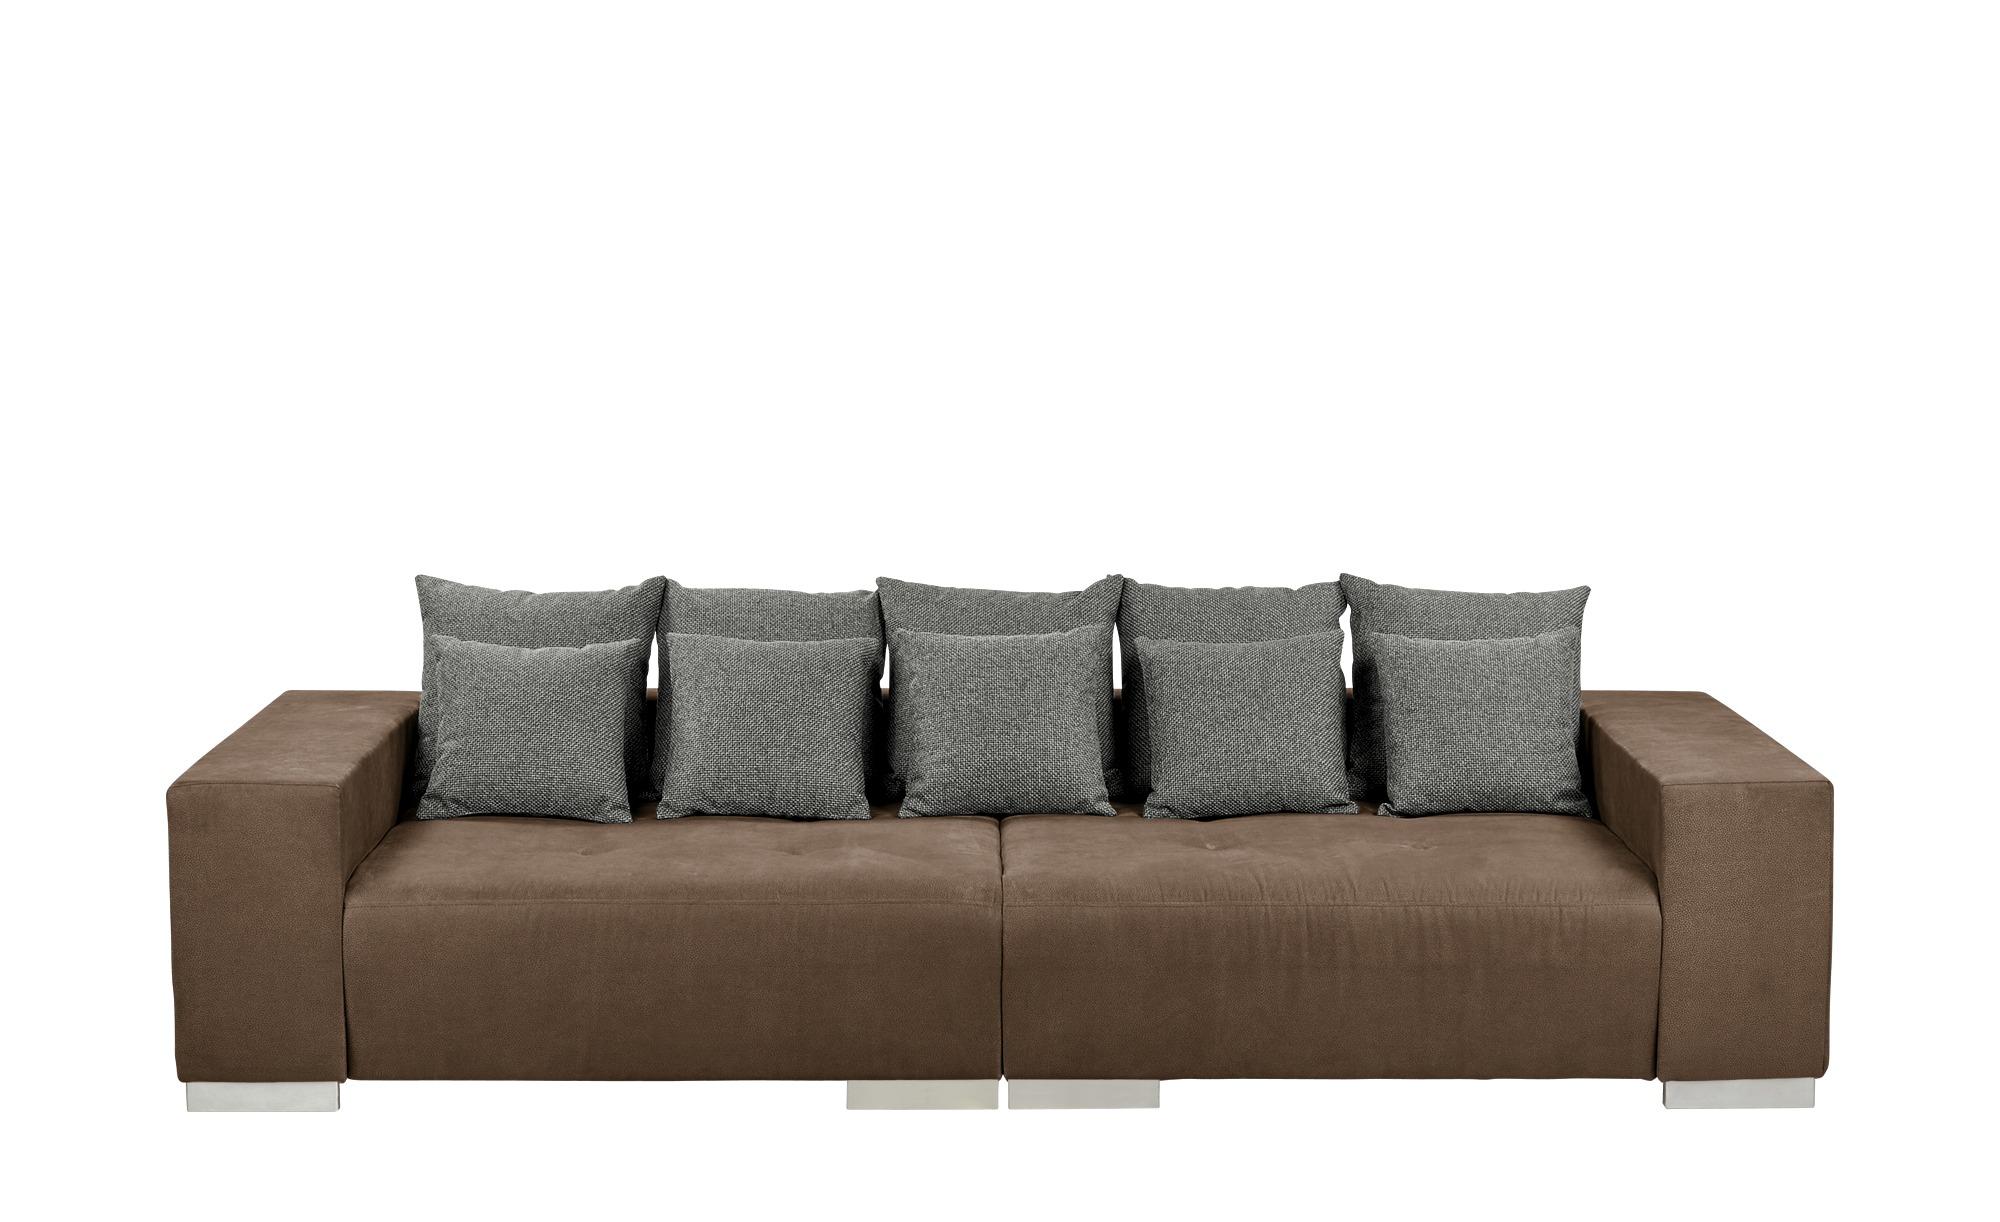 switch Big-Sofa braun - Mikrofaser Max ¦ braun ¦ Maße (cm): B: 300 H: 85 T: 136 Polstermöbel > Sofas > Big-Sofas - Höffner